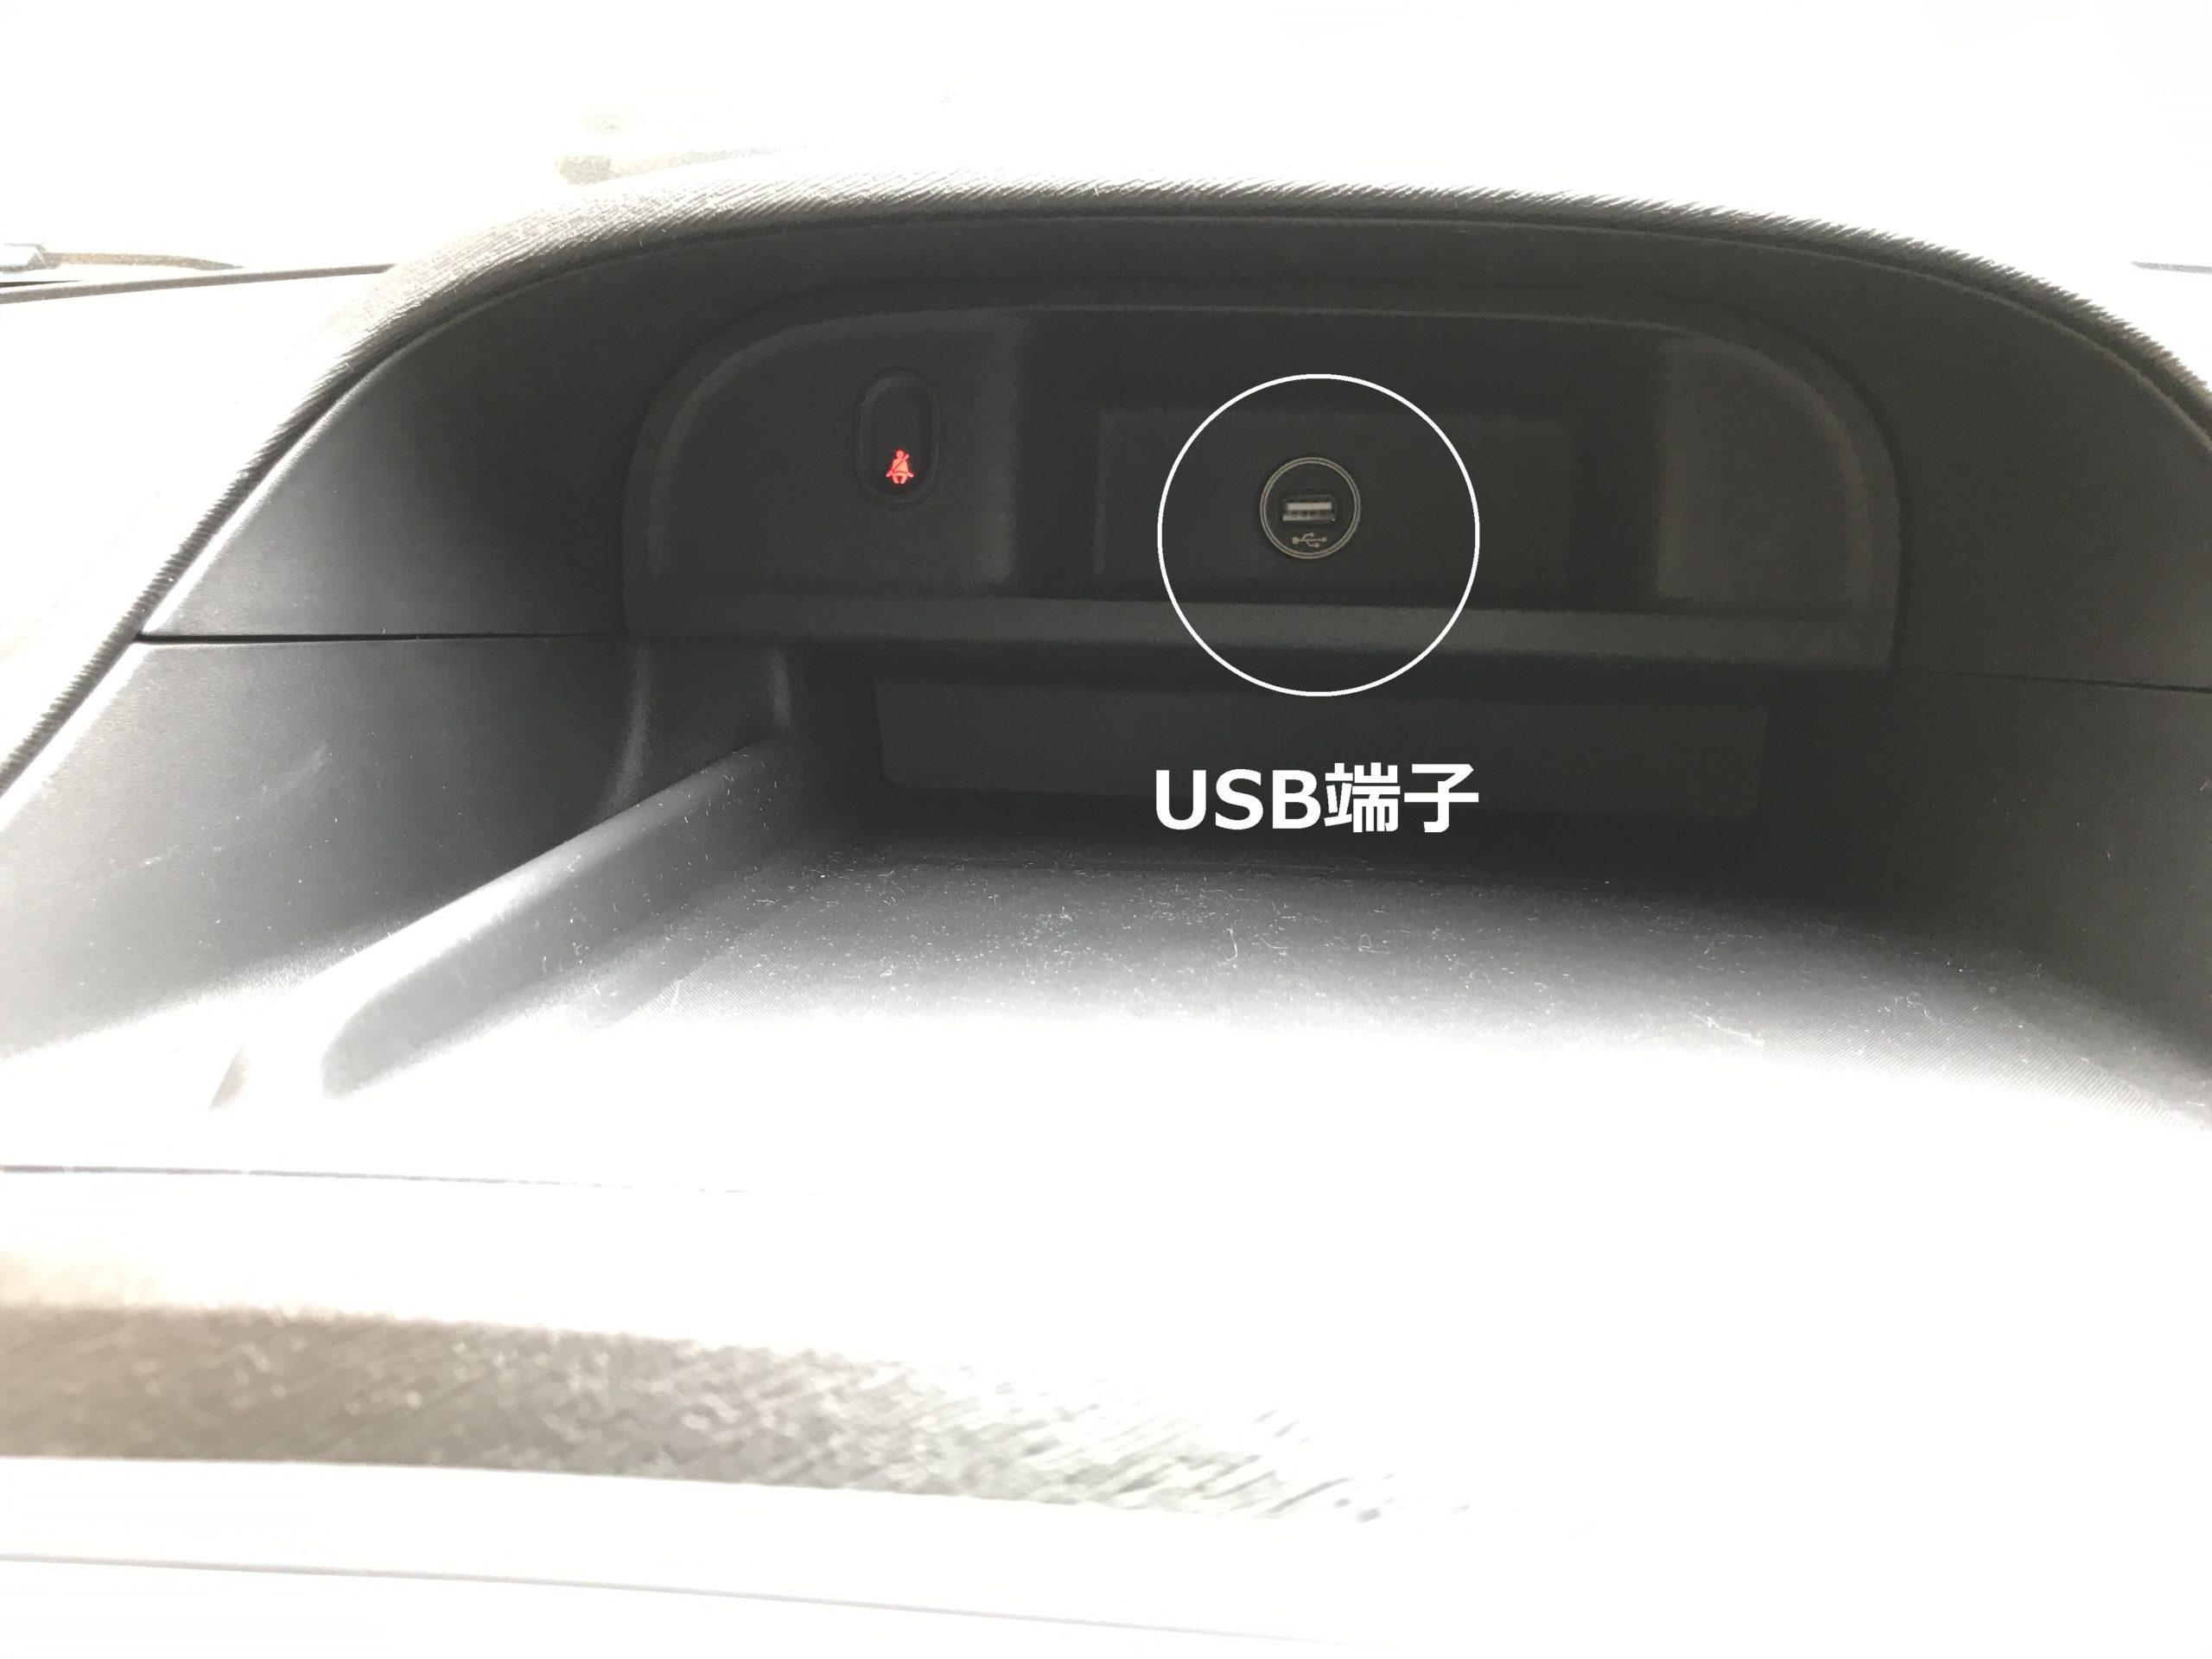 USB端子の設置